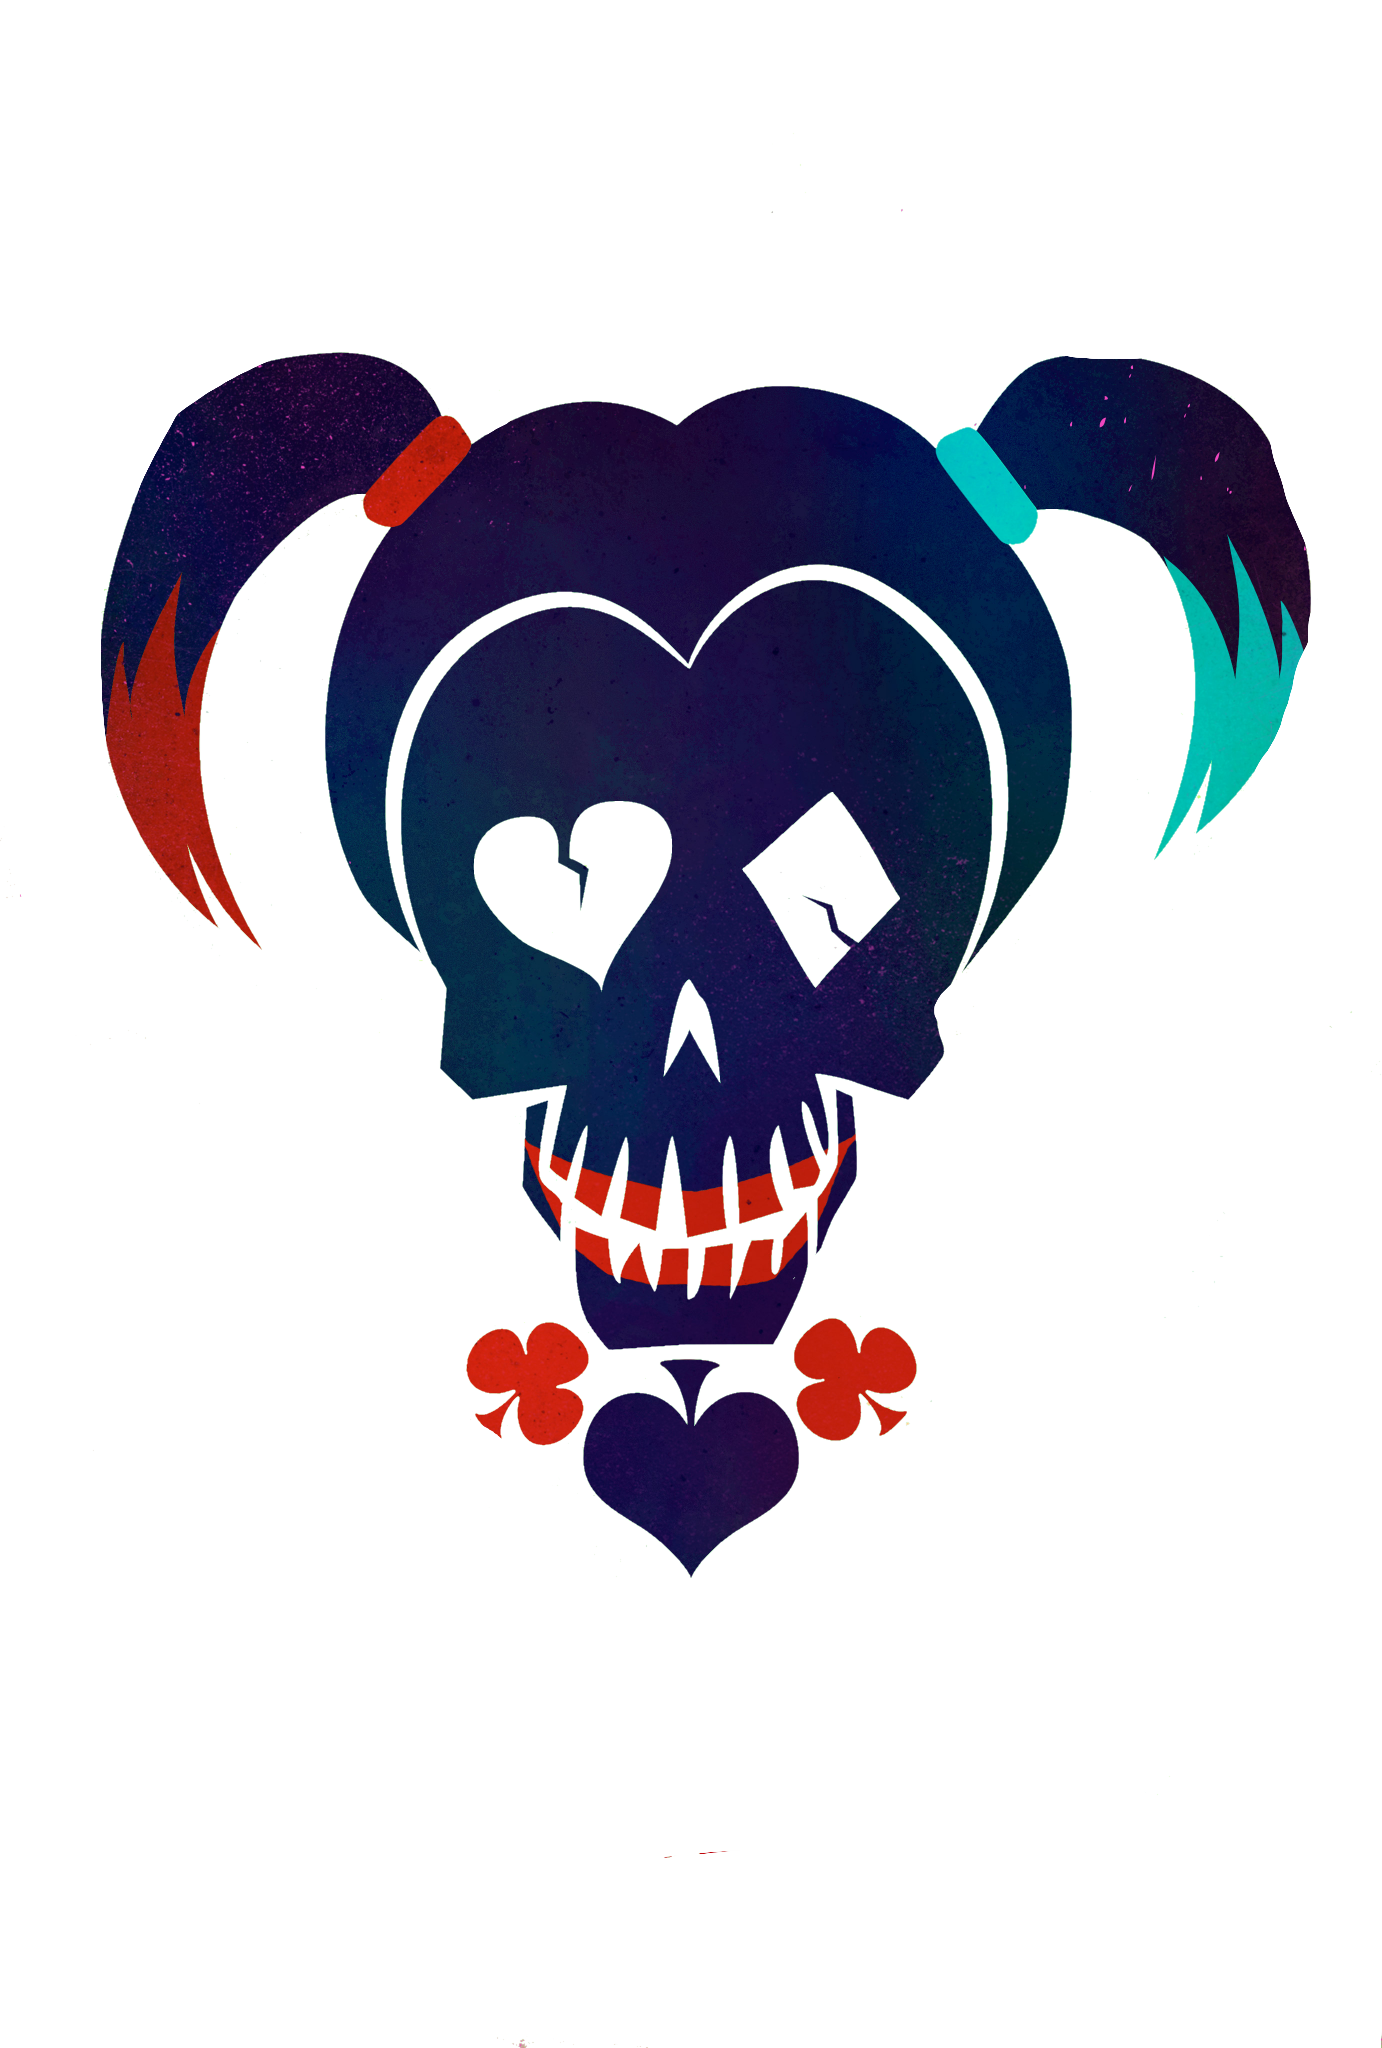 Girl at getdrawings com. Wing clipart skull